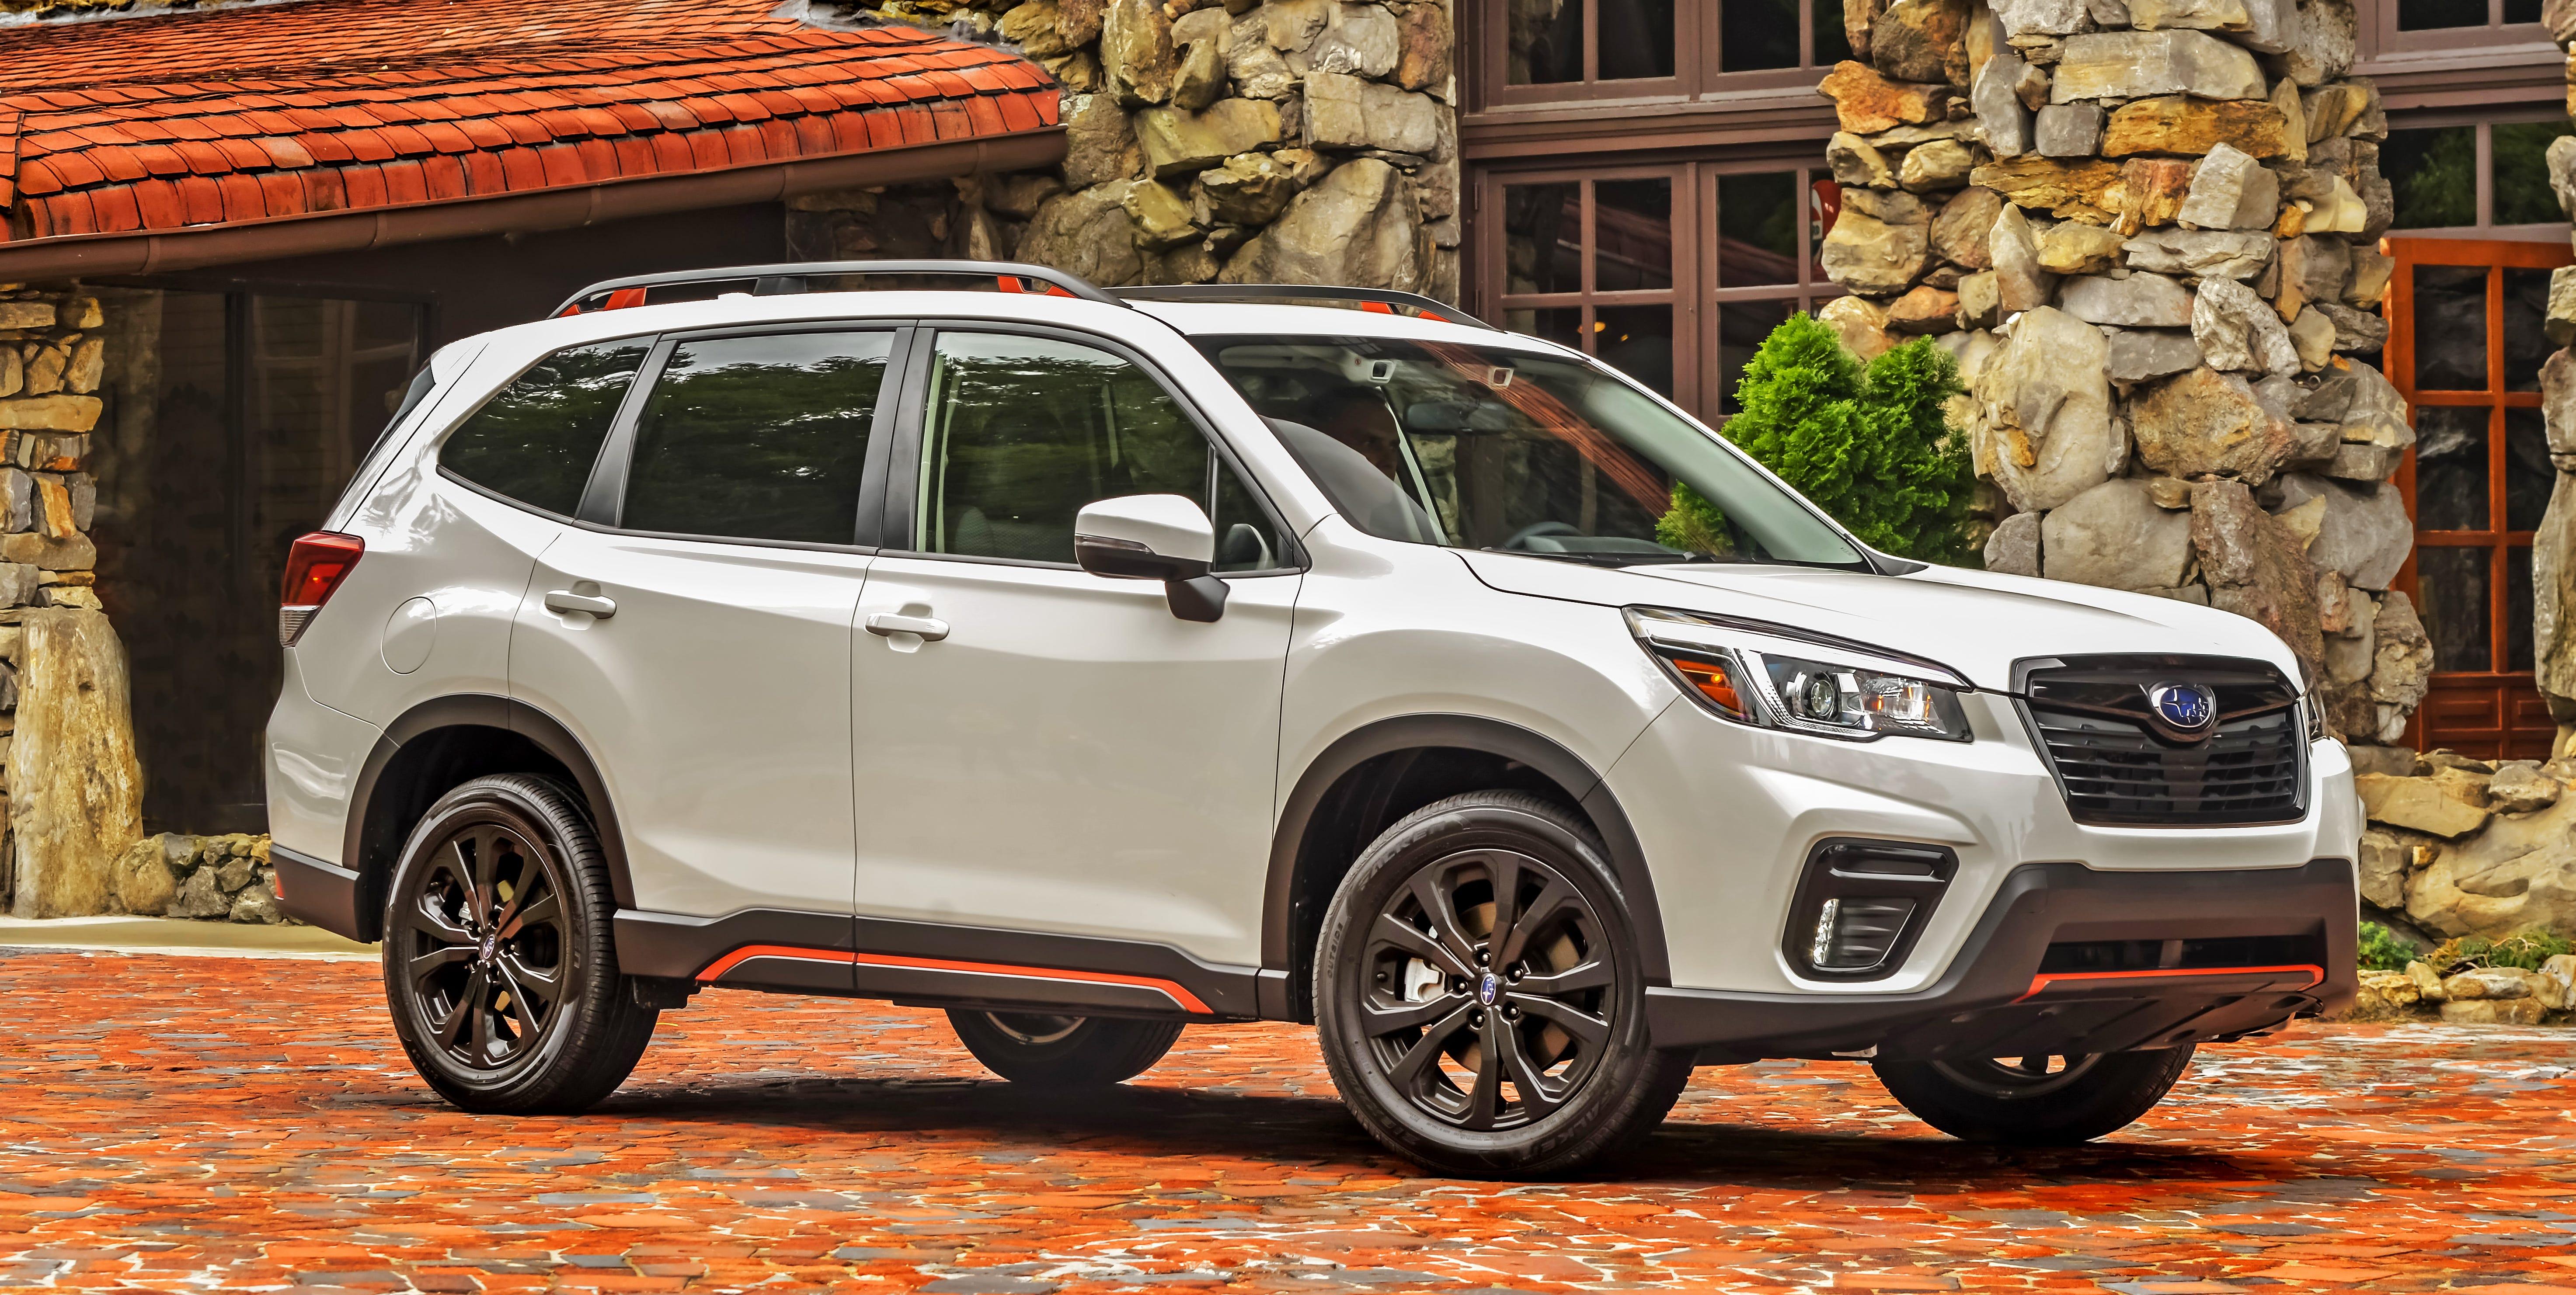 The 2019 Subaru Forester Sport